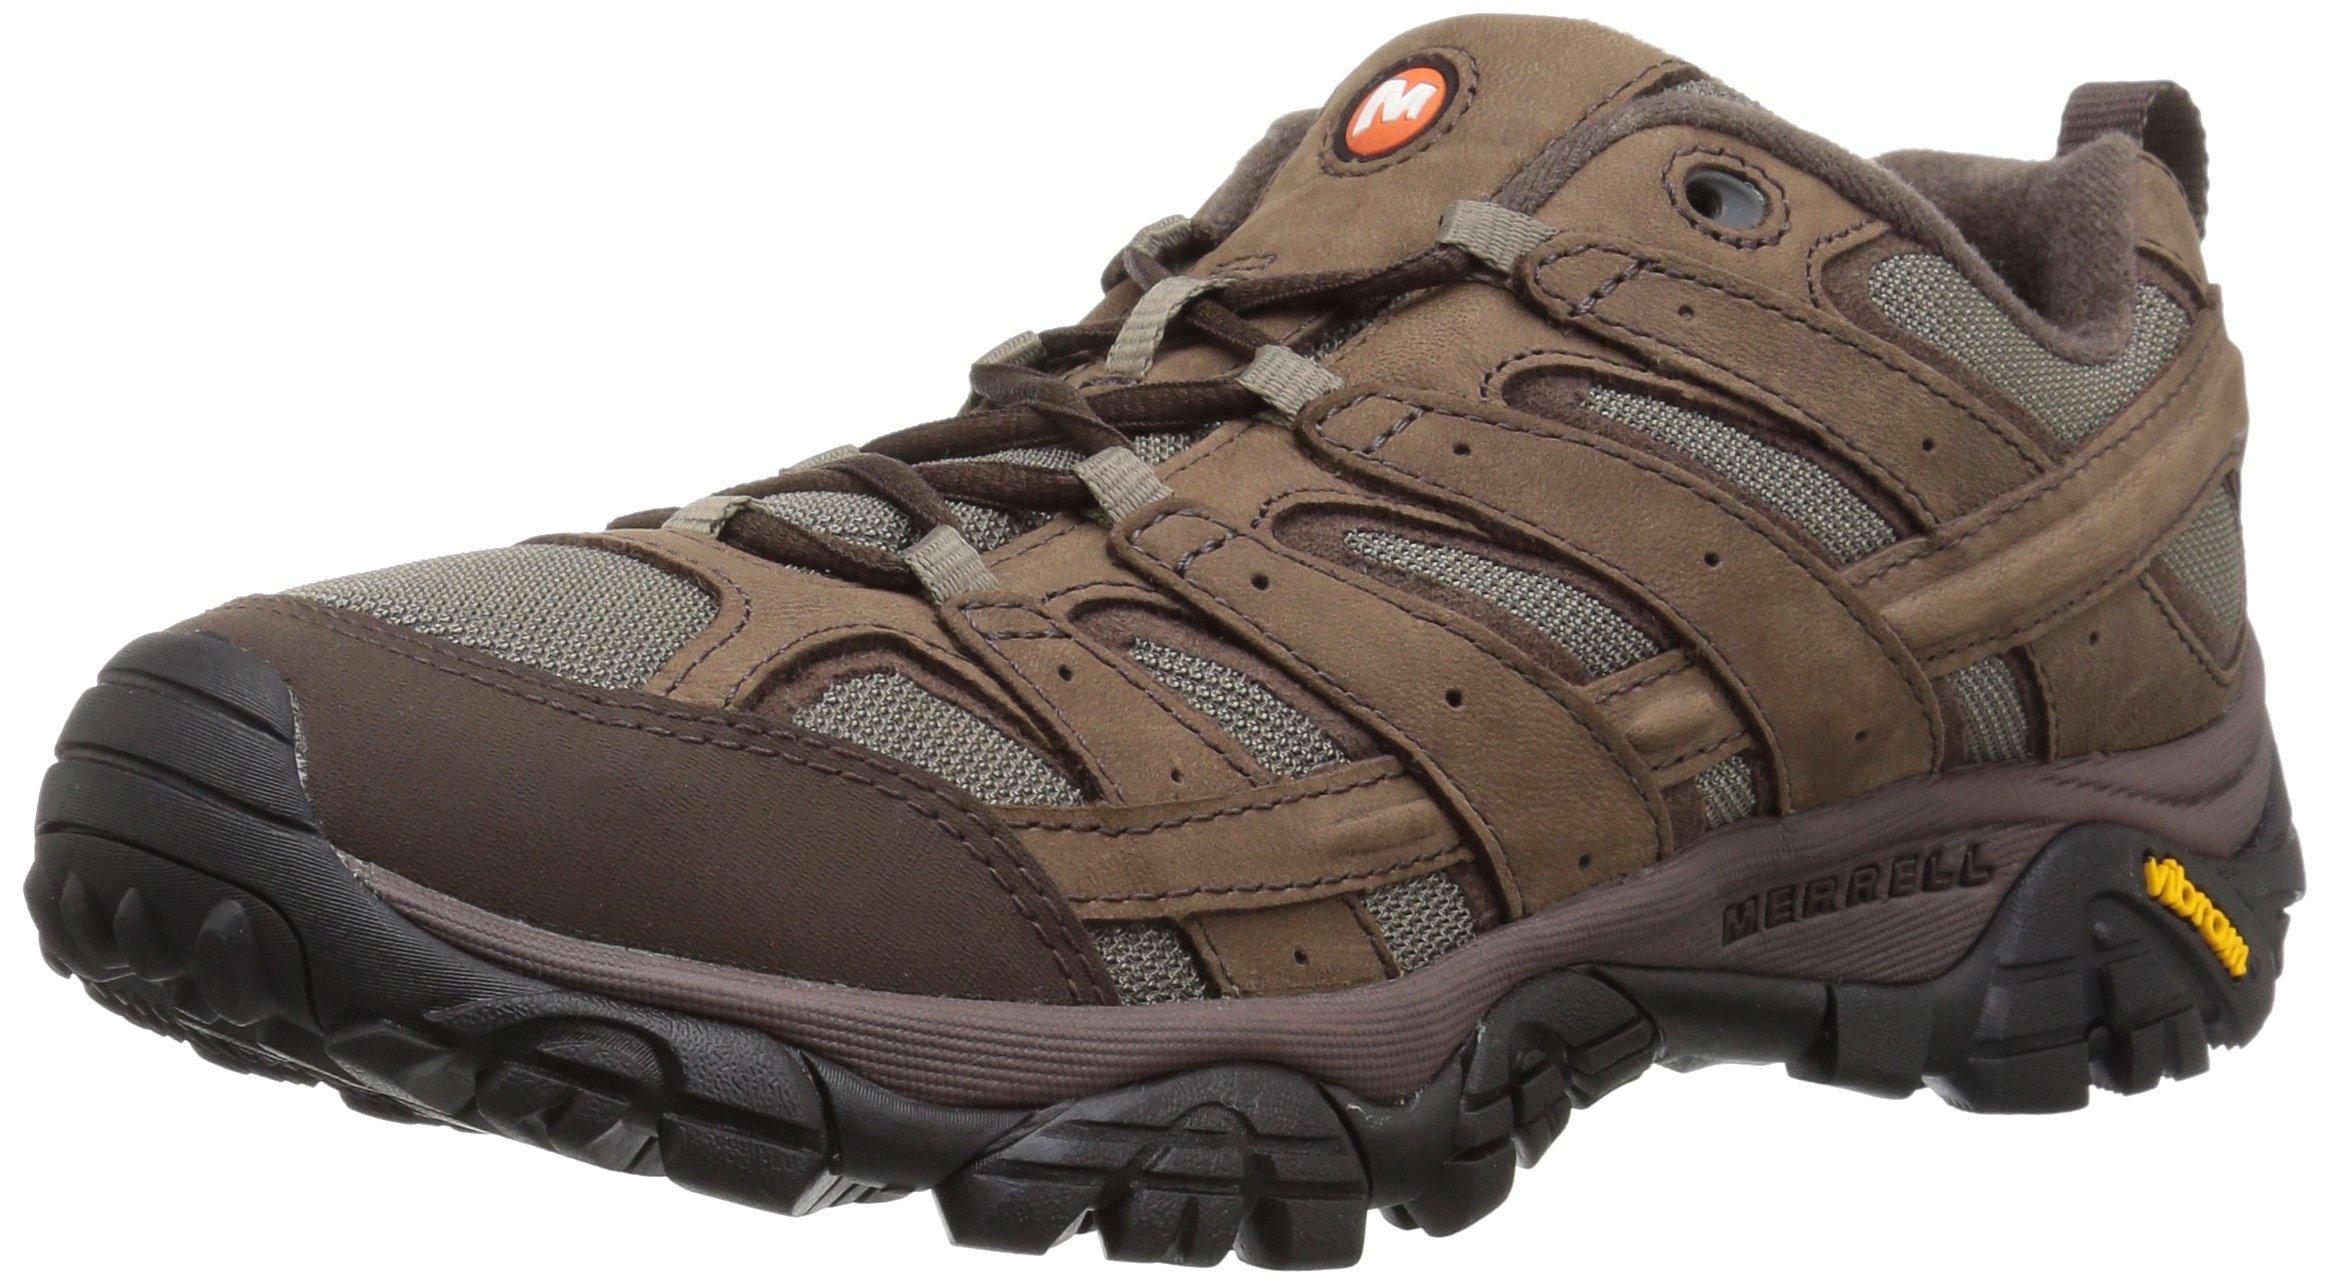 Merrell Men's Moab 2 Smooth Hiking Boot, Bracken, 9.5 M US